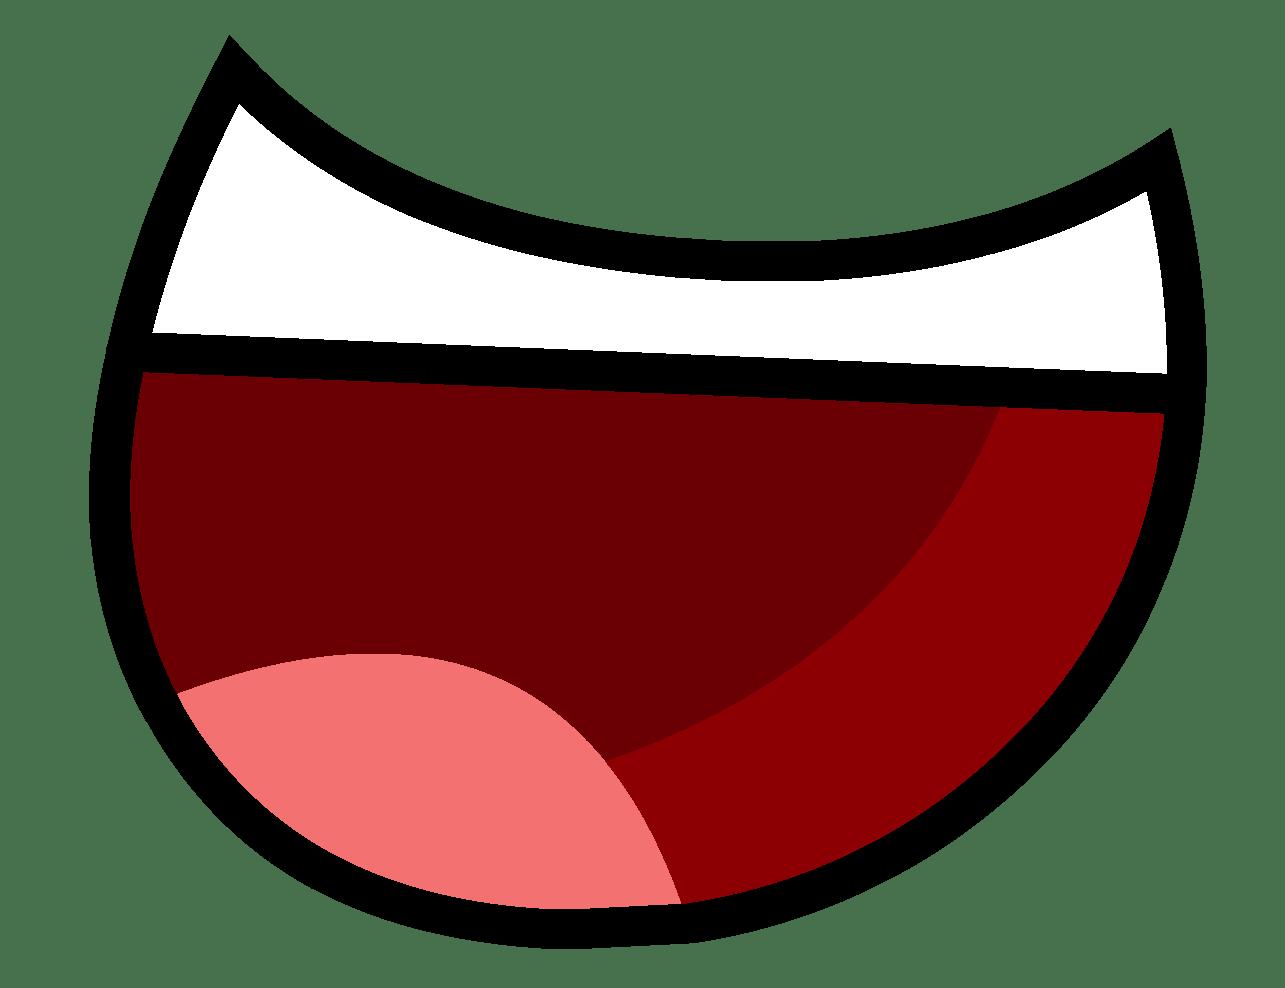 1285x988 Cartoon Mouth Basket Cartoon And People